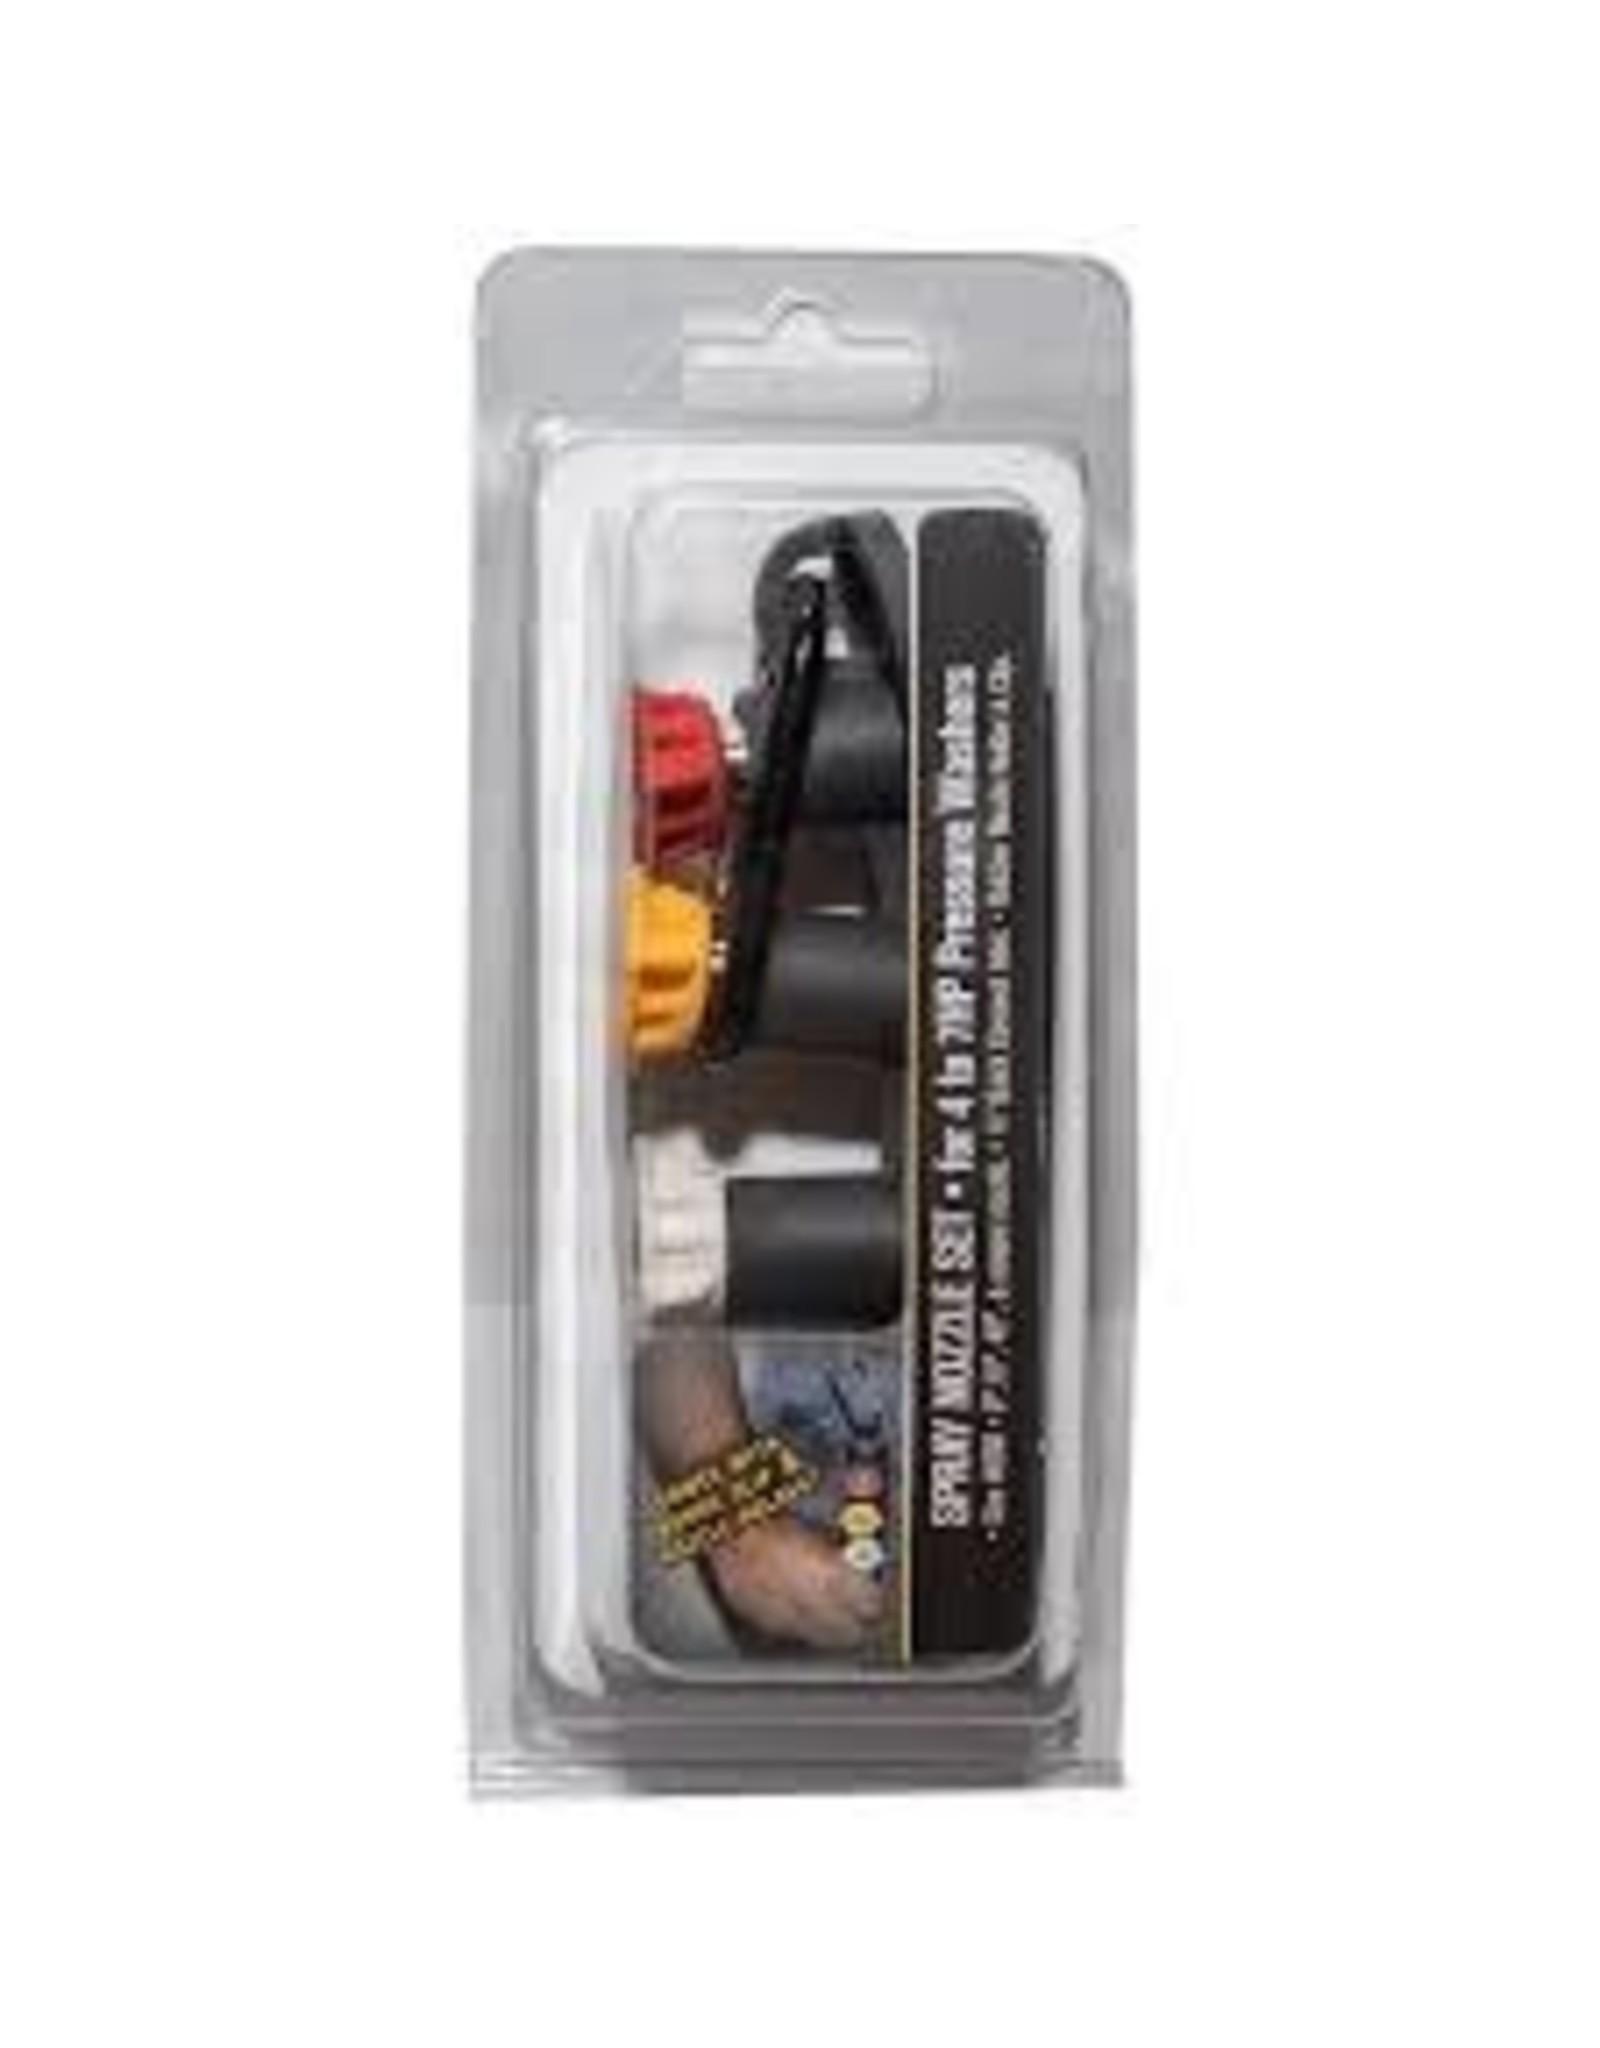 BE 35.210.034BEP #3.0 Nozzle Set W / Holder